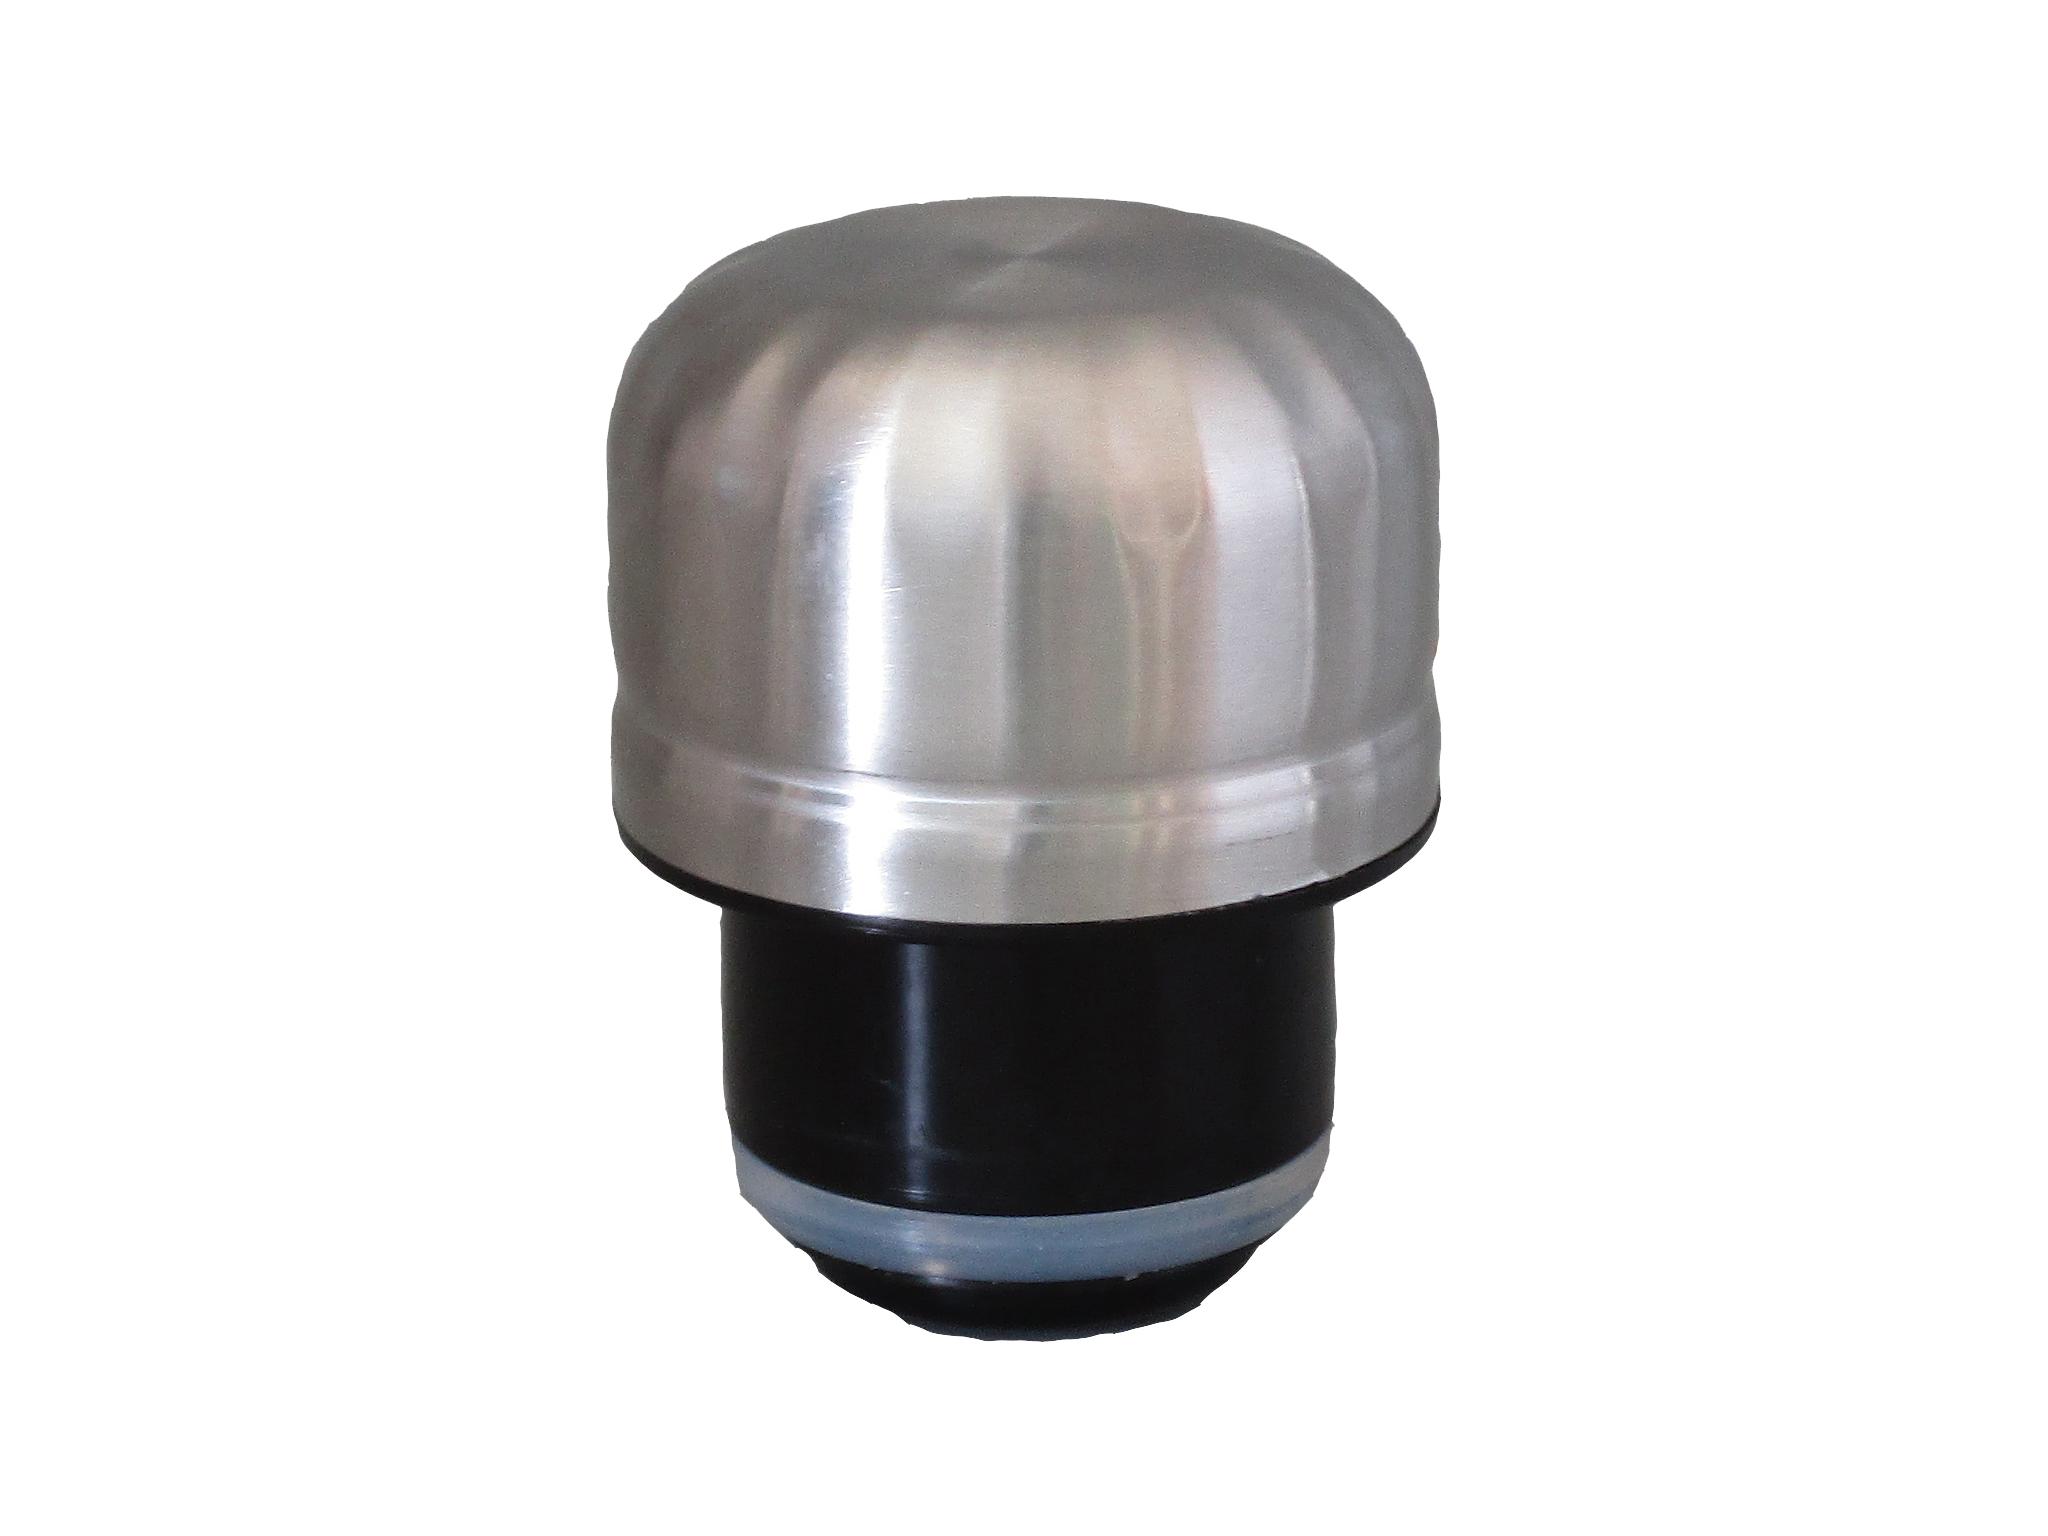 TANGO050-001 - Vacuum flask SS unbreakable white 0.50 L - Isobel